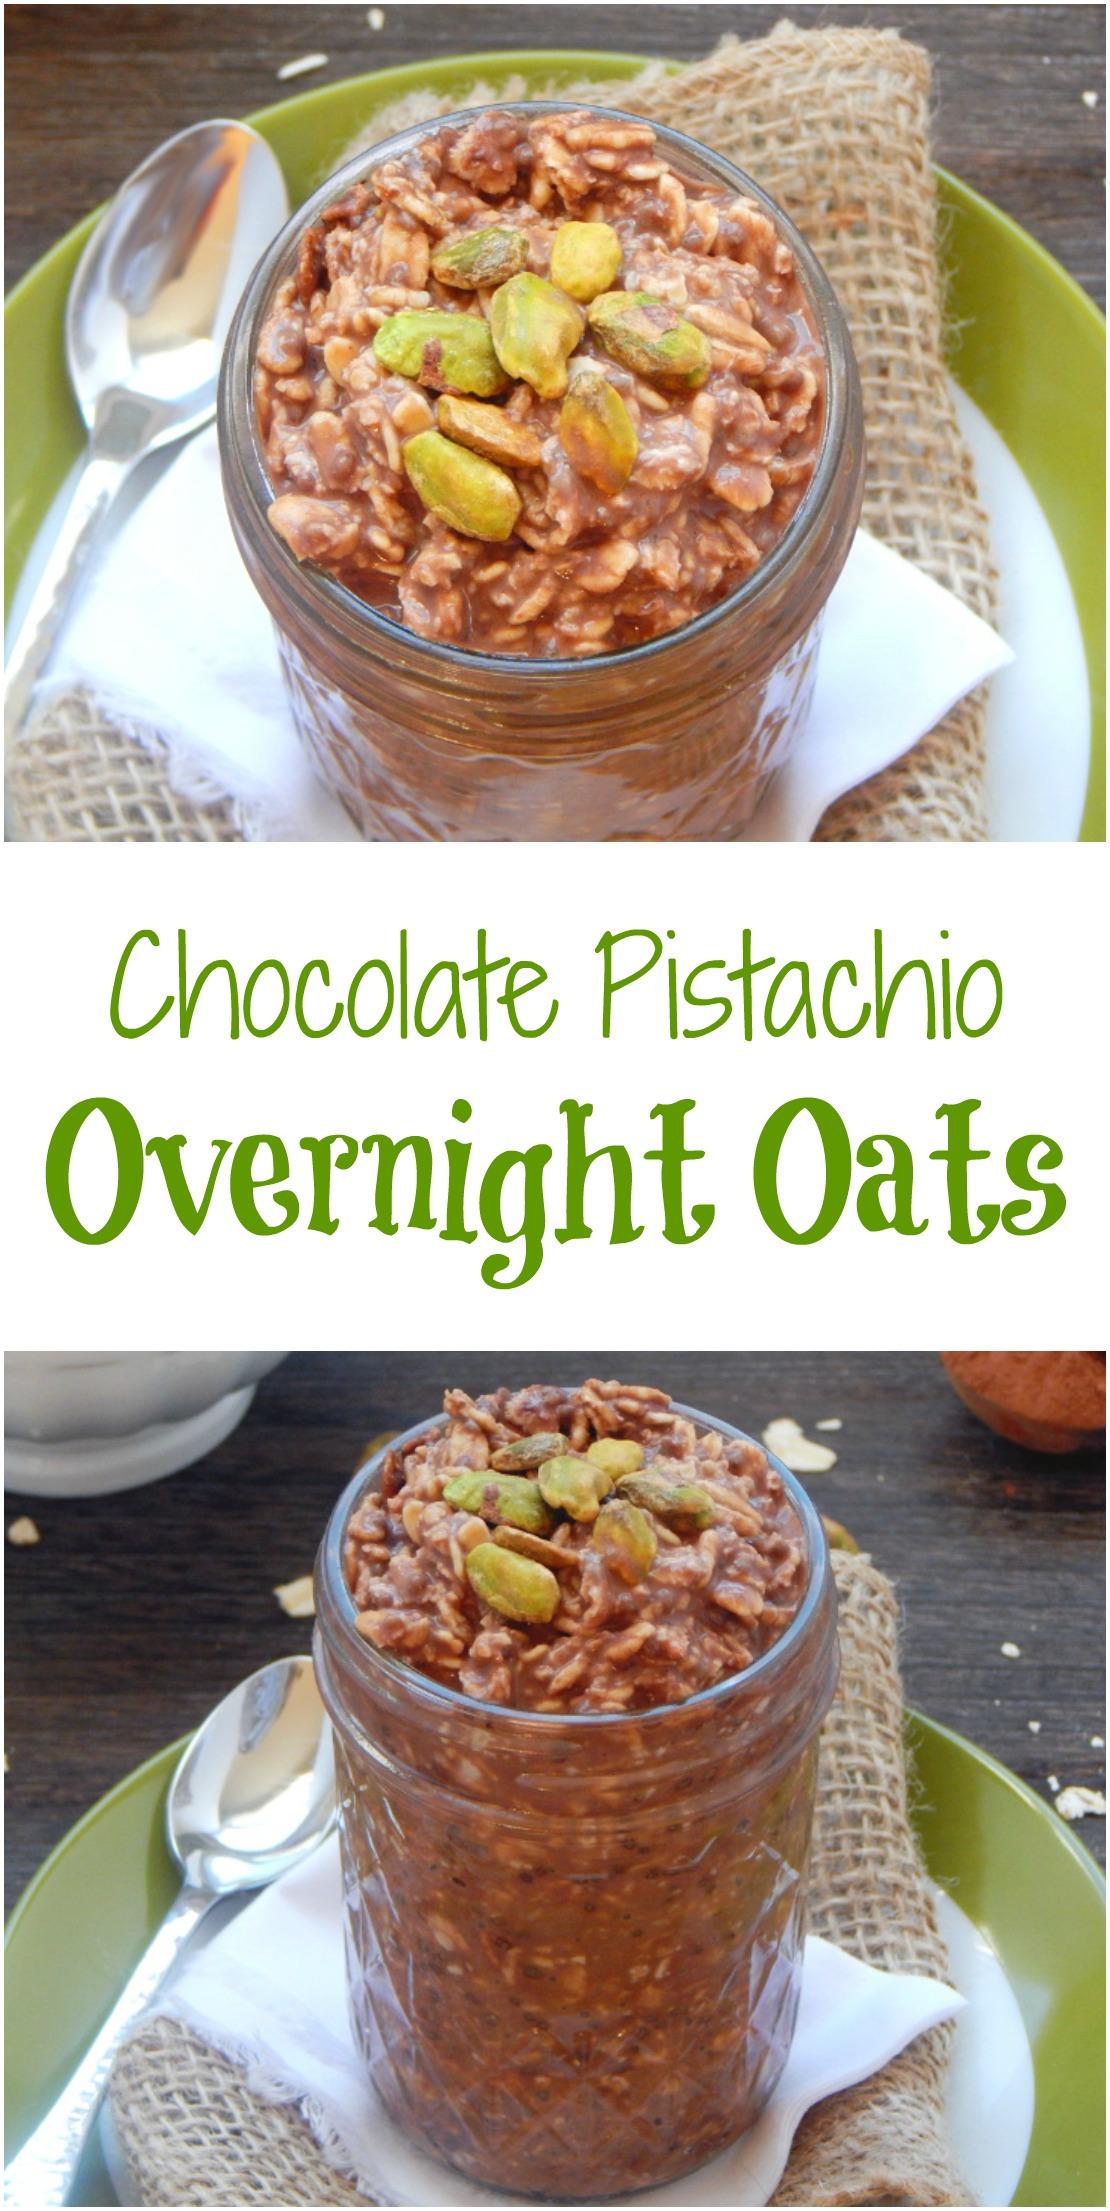 Chocolate Pistachio Overnight Oats